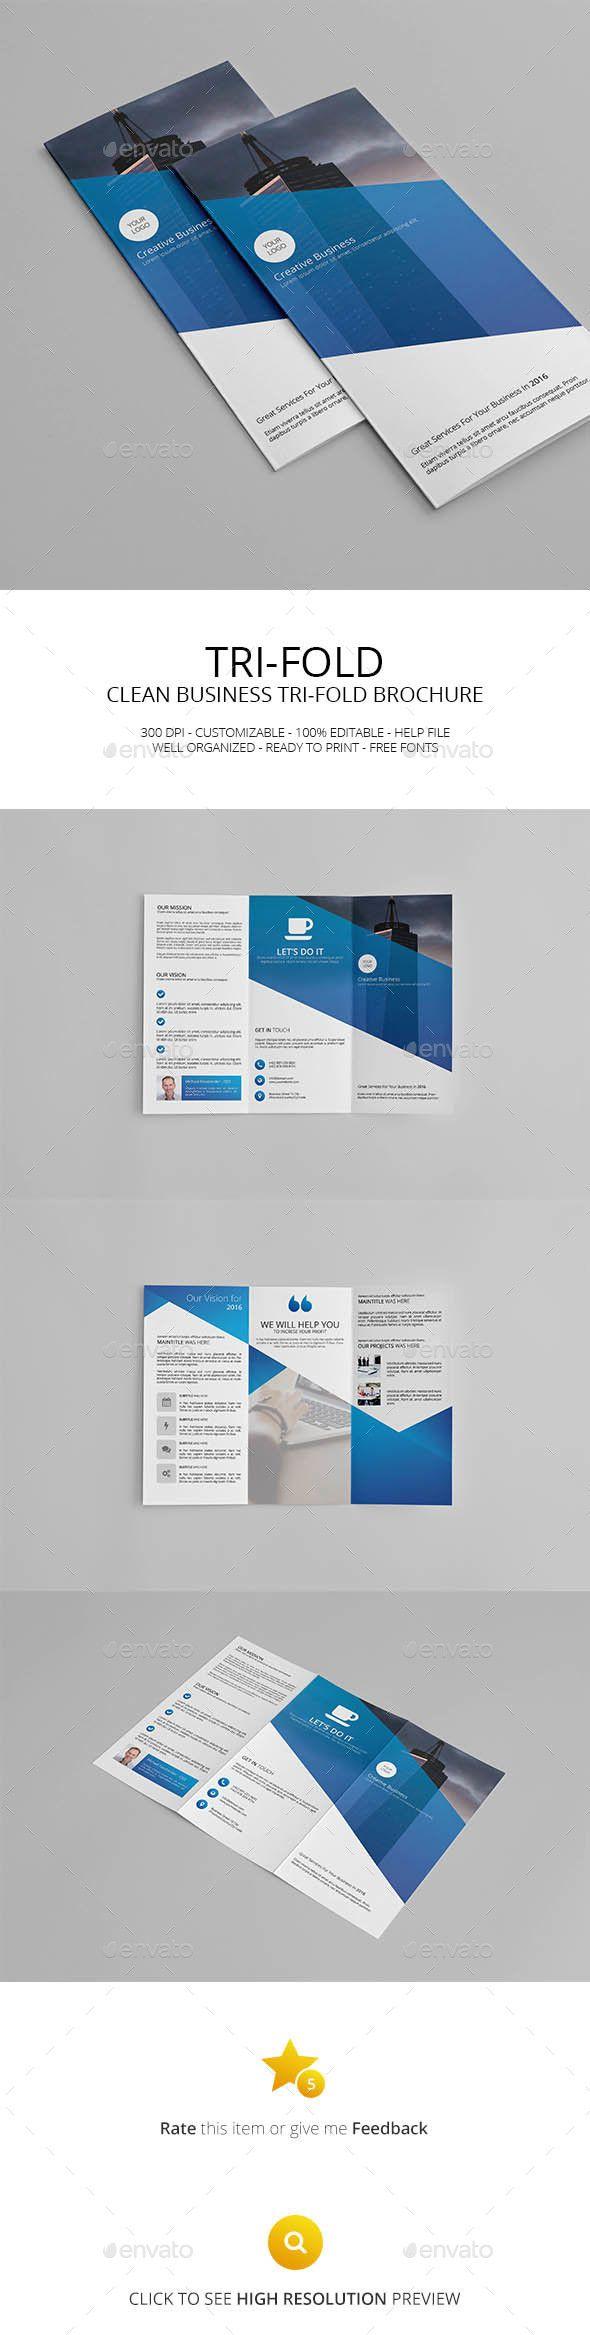 Clean Business Tri Fold Brochure Template Psd Design Download Http